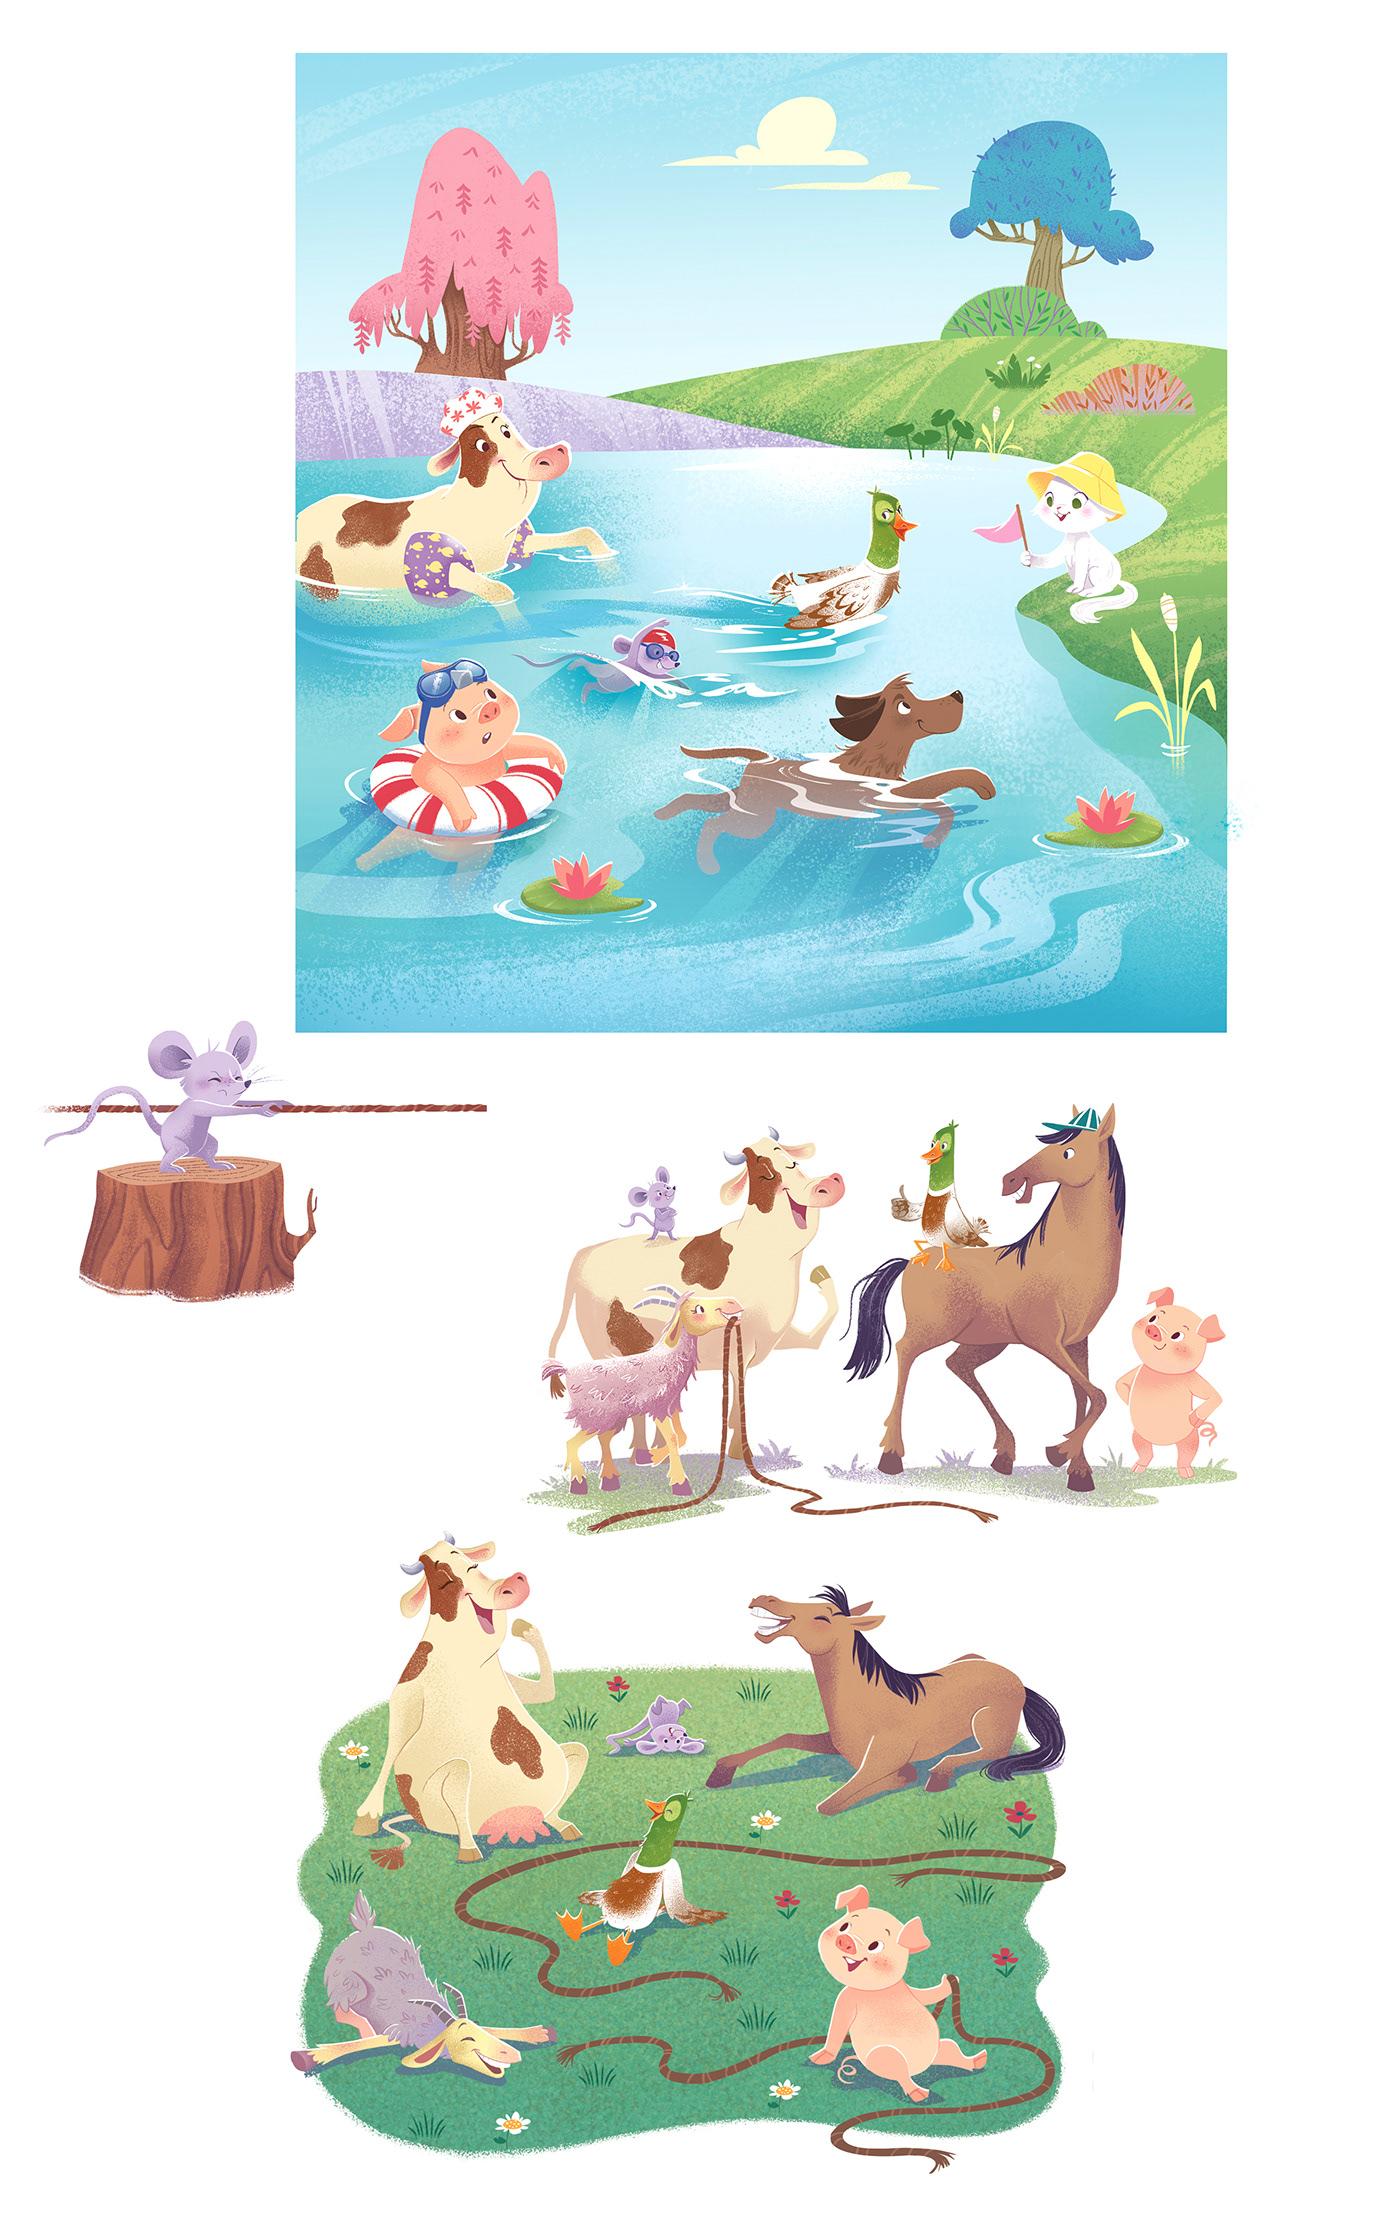 Image may contain: cartoon and animal